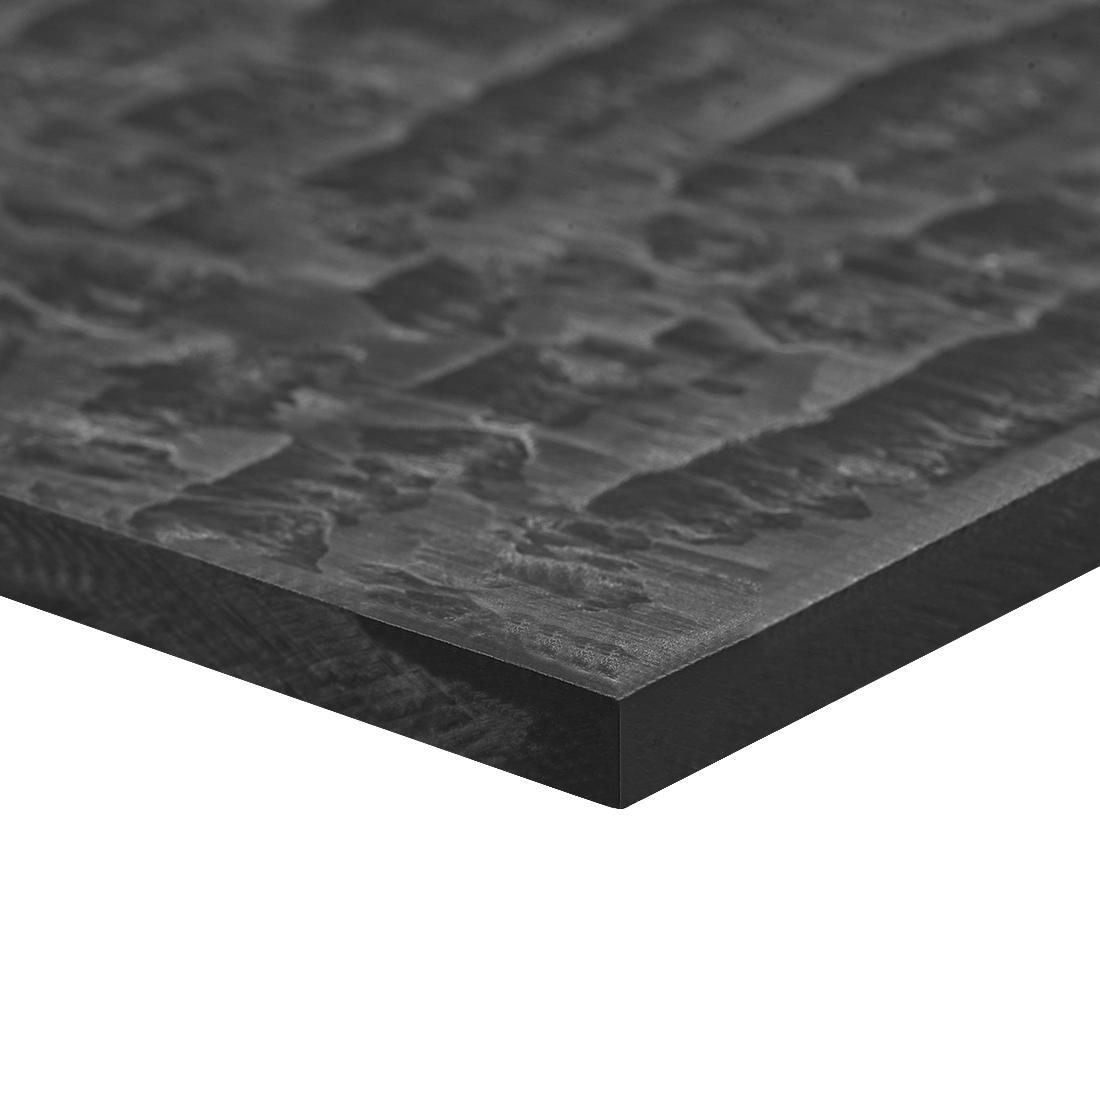 Acetal POM Sheet Polyoxymethylene Plate Sheet 200 x 200 x 5mm Black